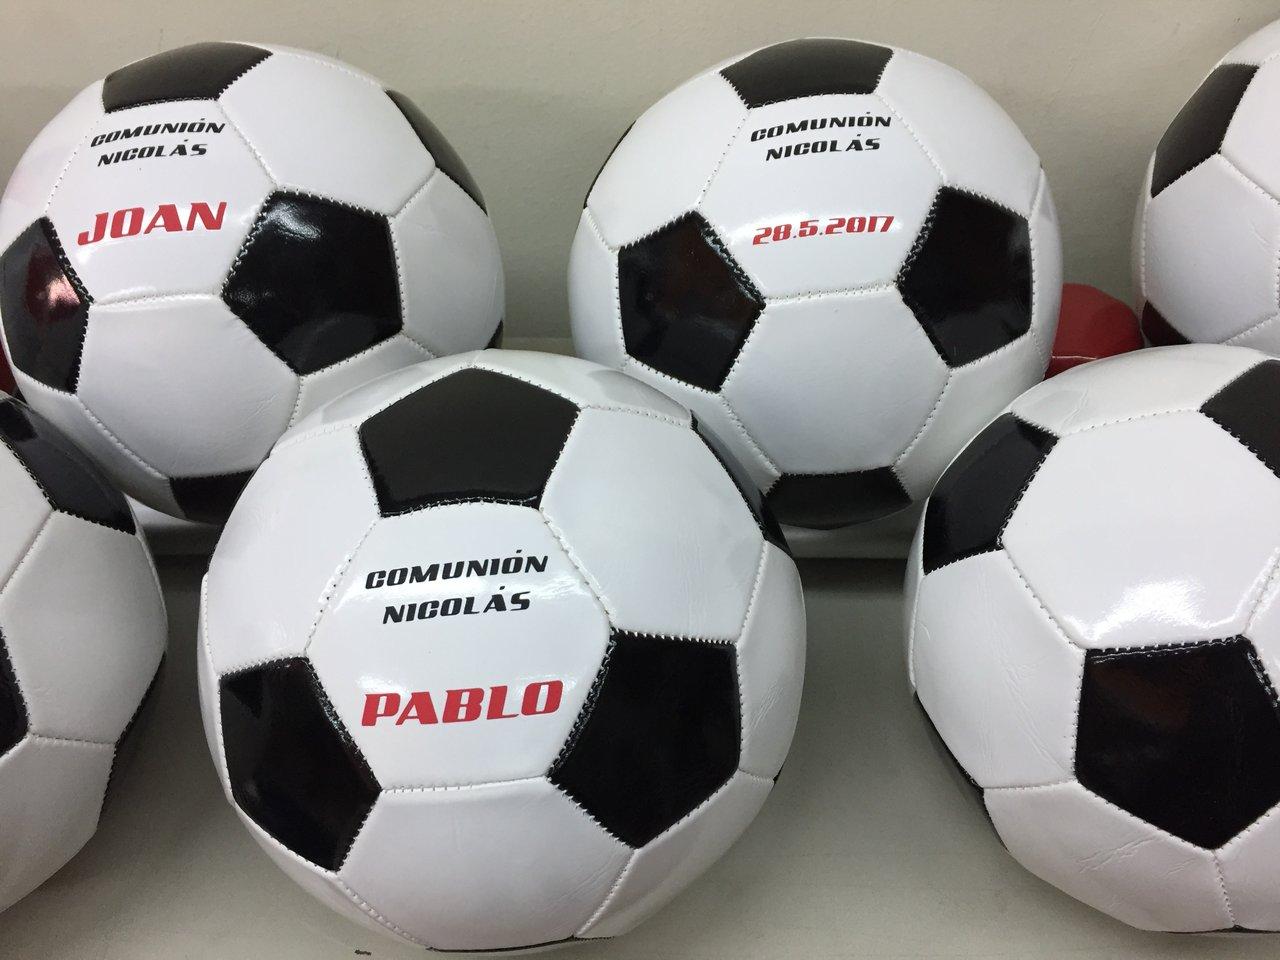 regalos comunion futbol